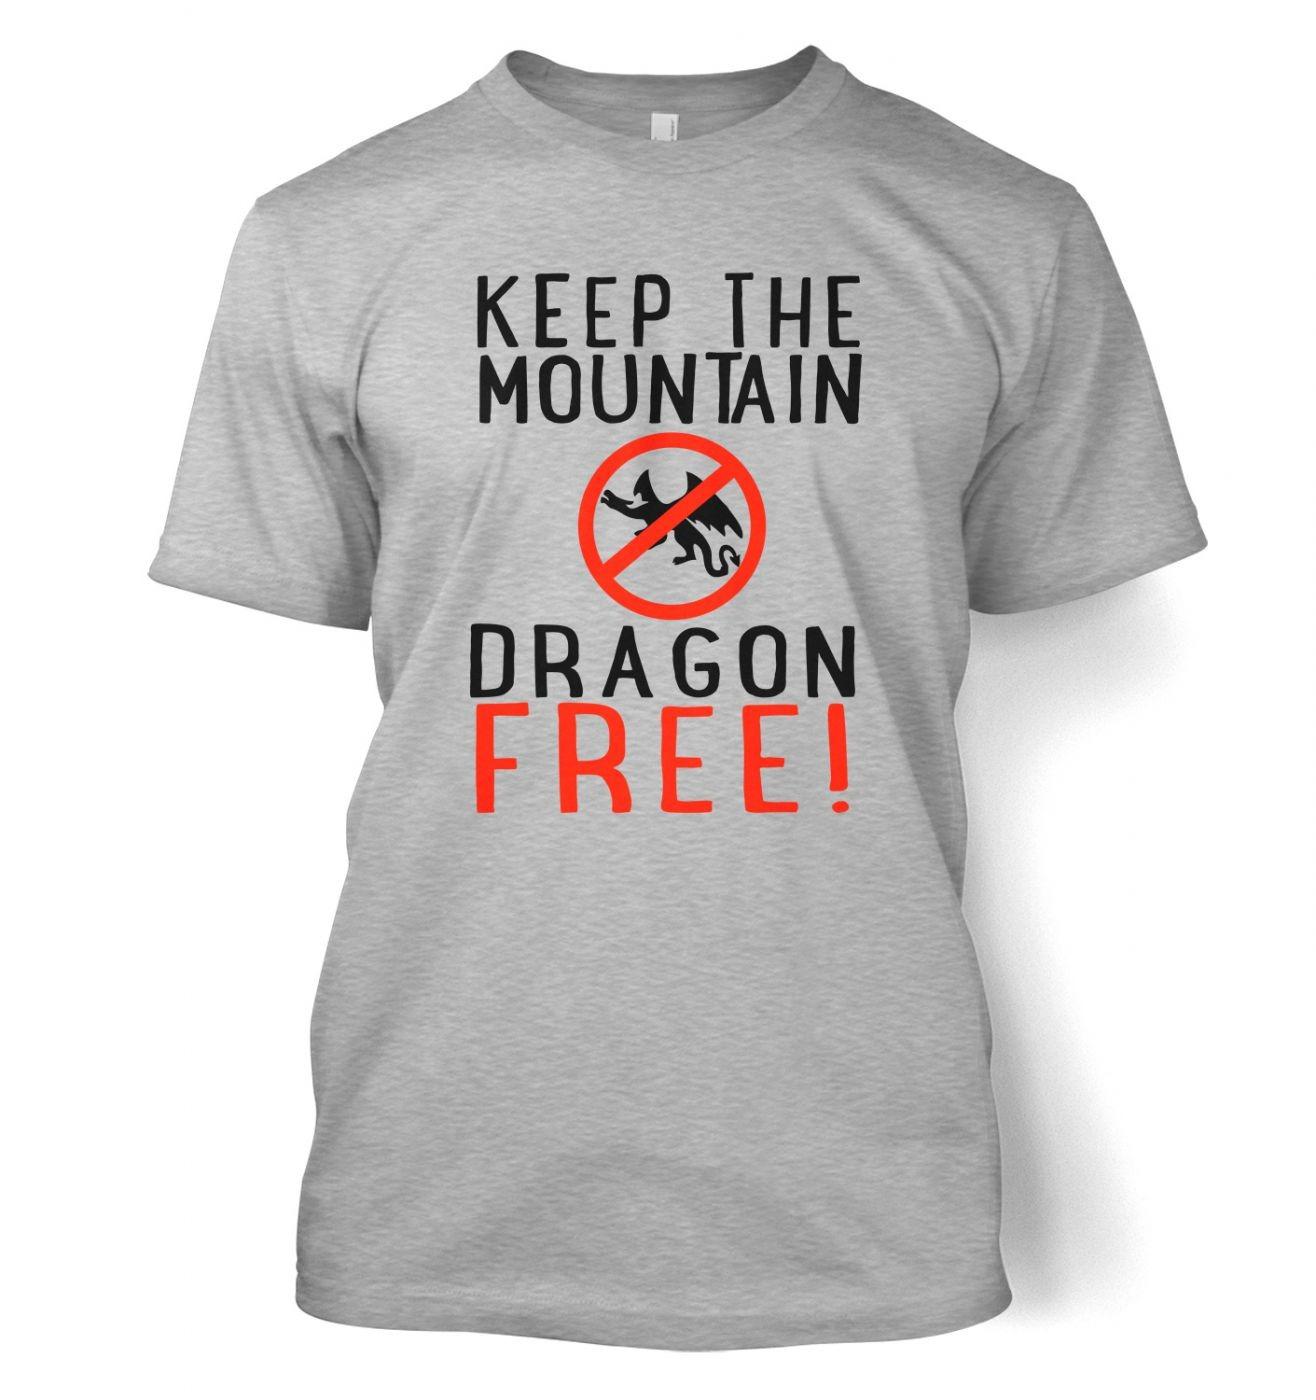 Keep The Mountain Dragon Free t-shirt